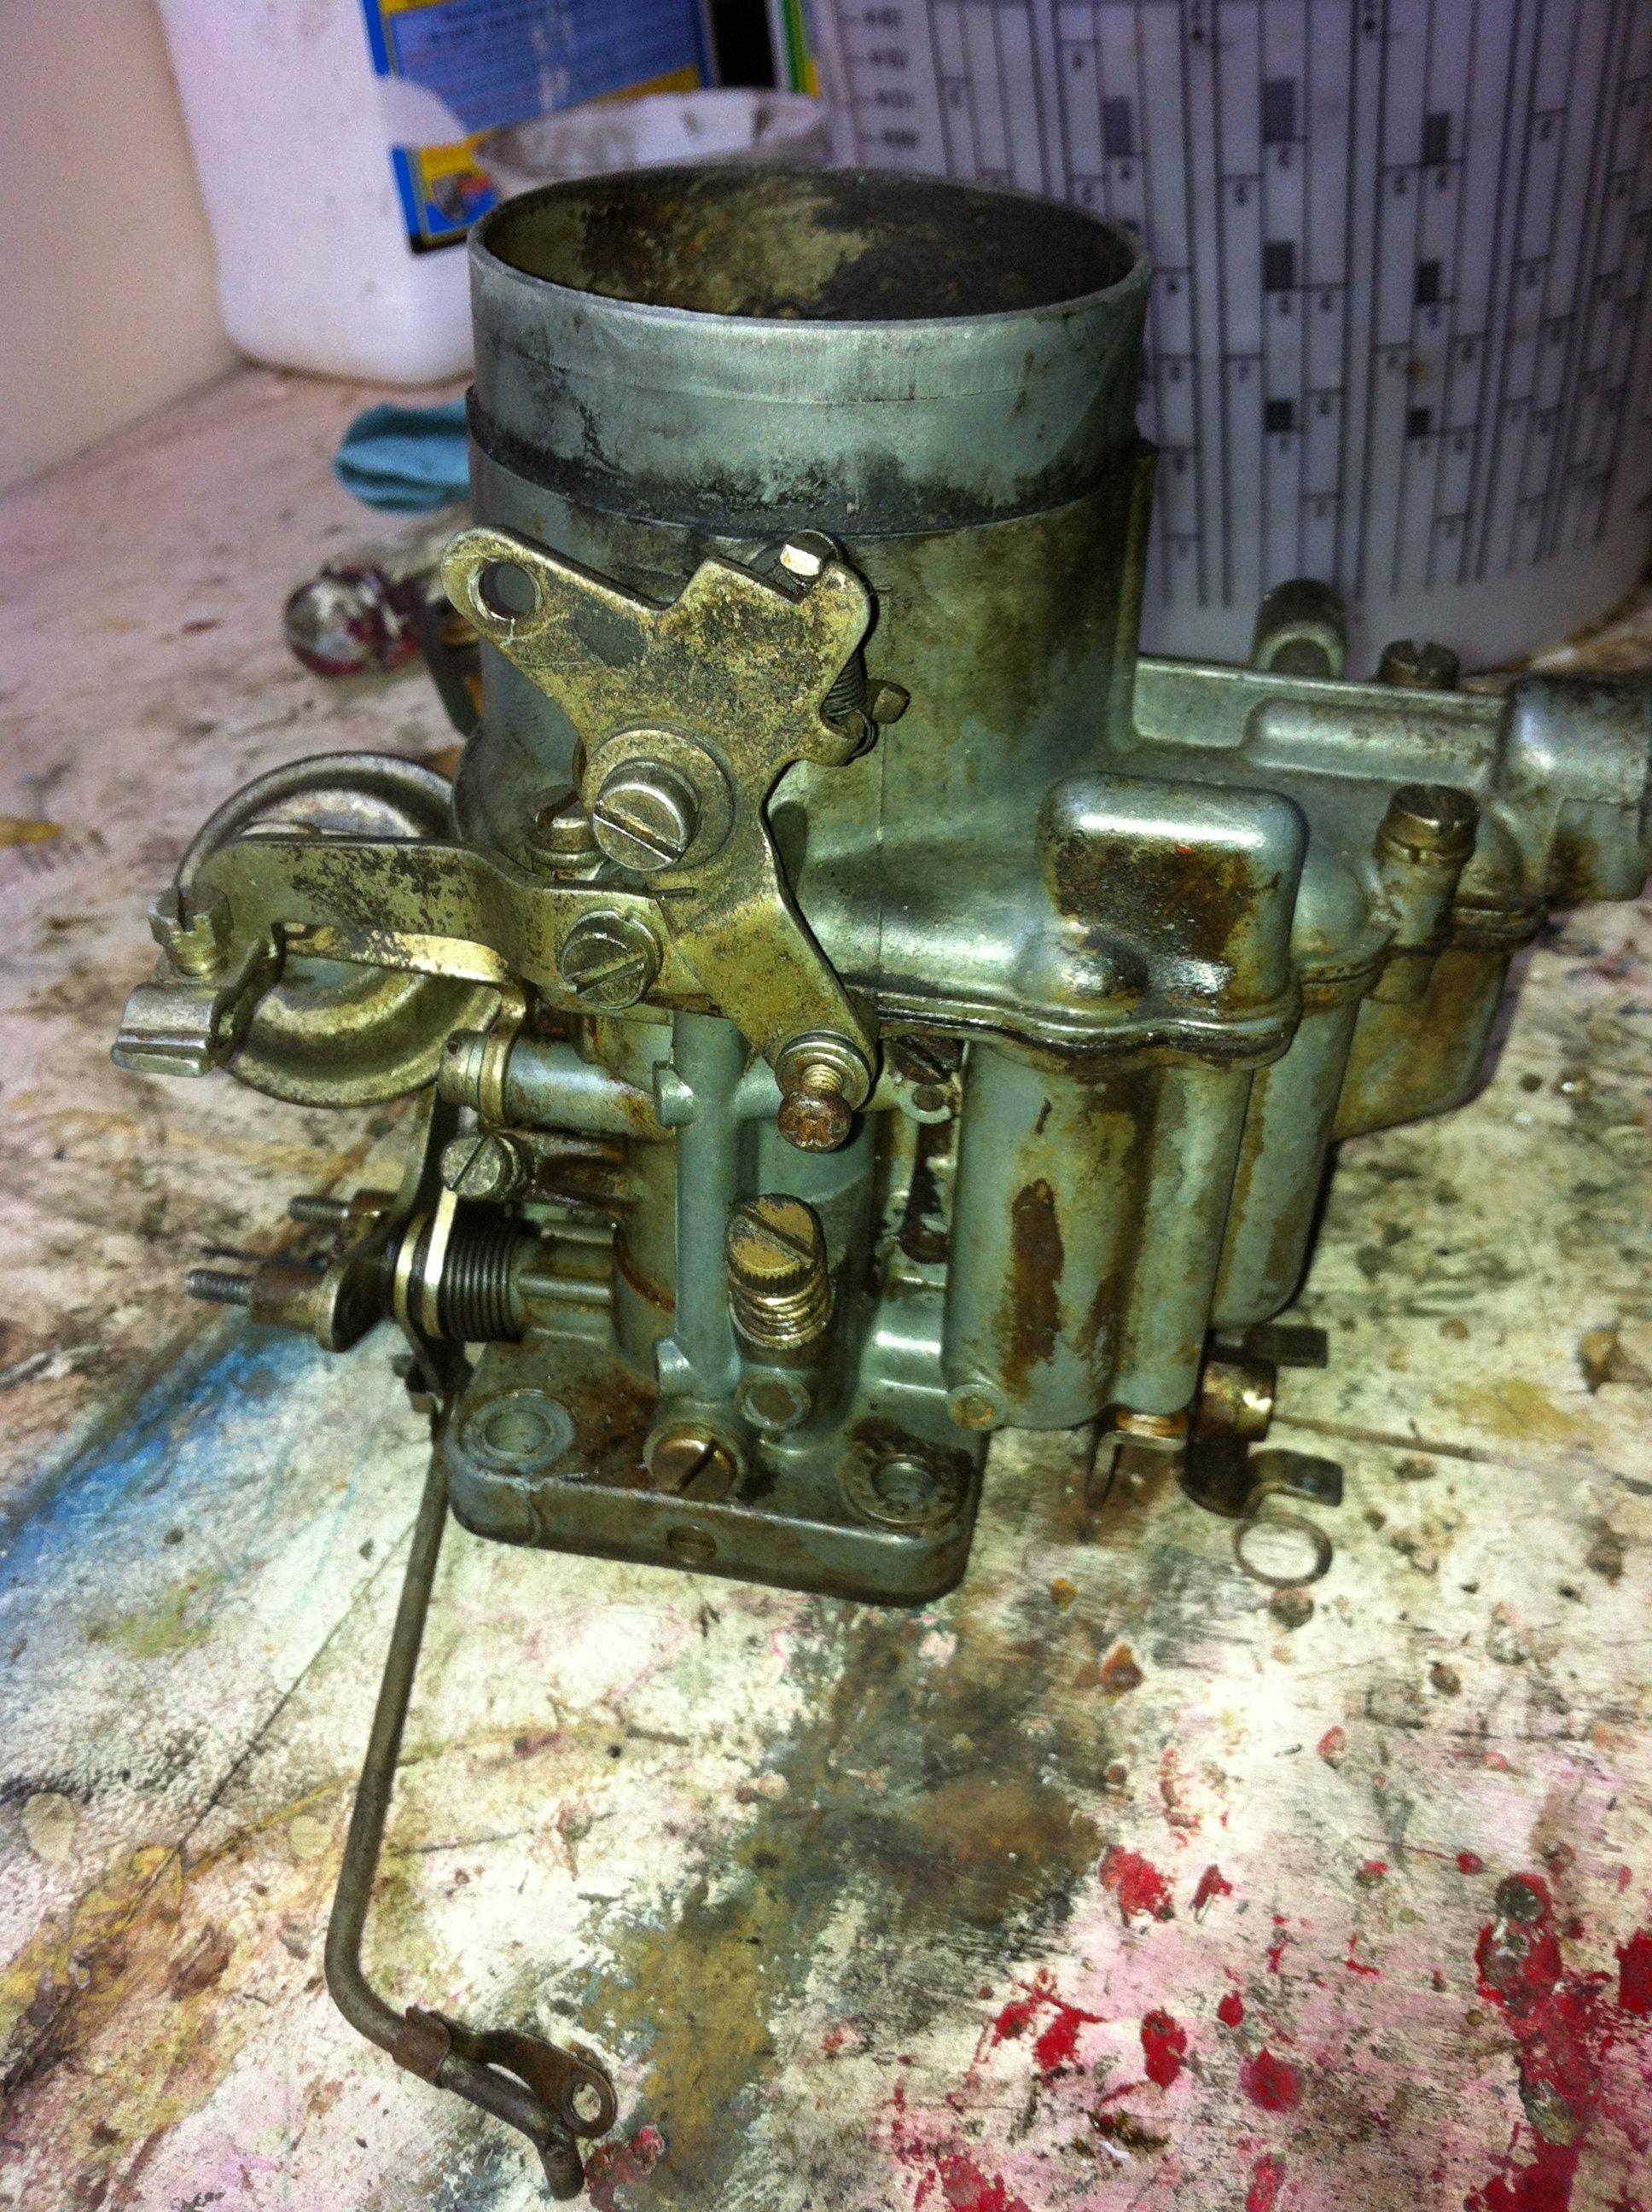 Weber carburetor is disassembled for cleaning